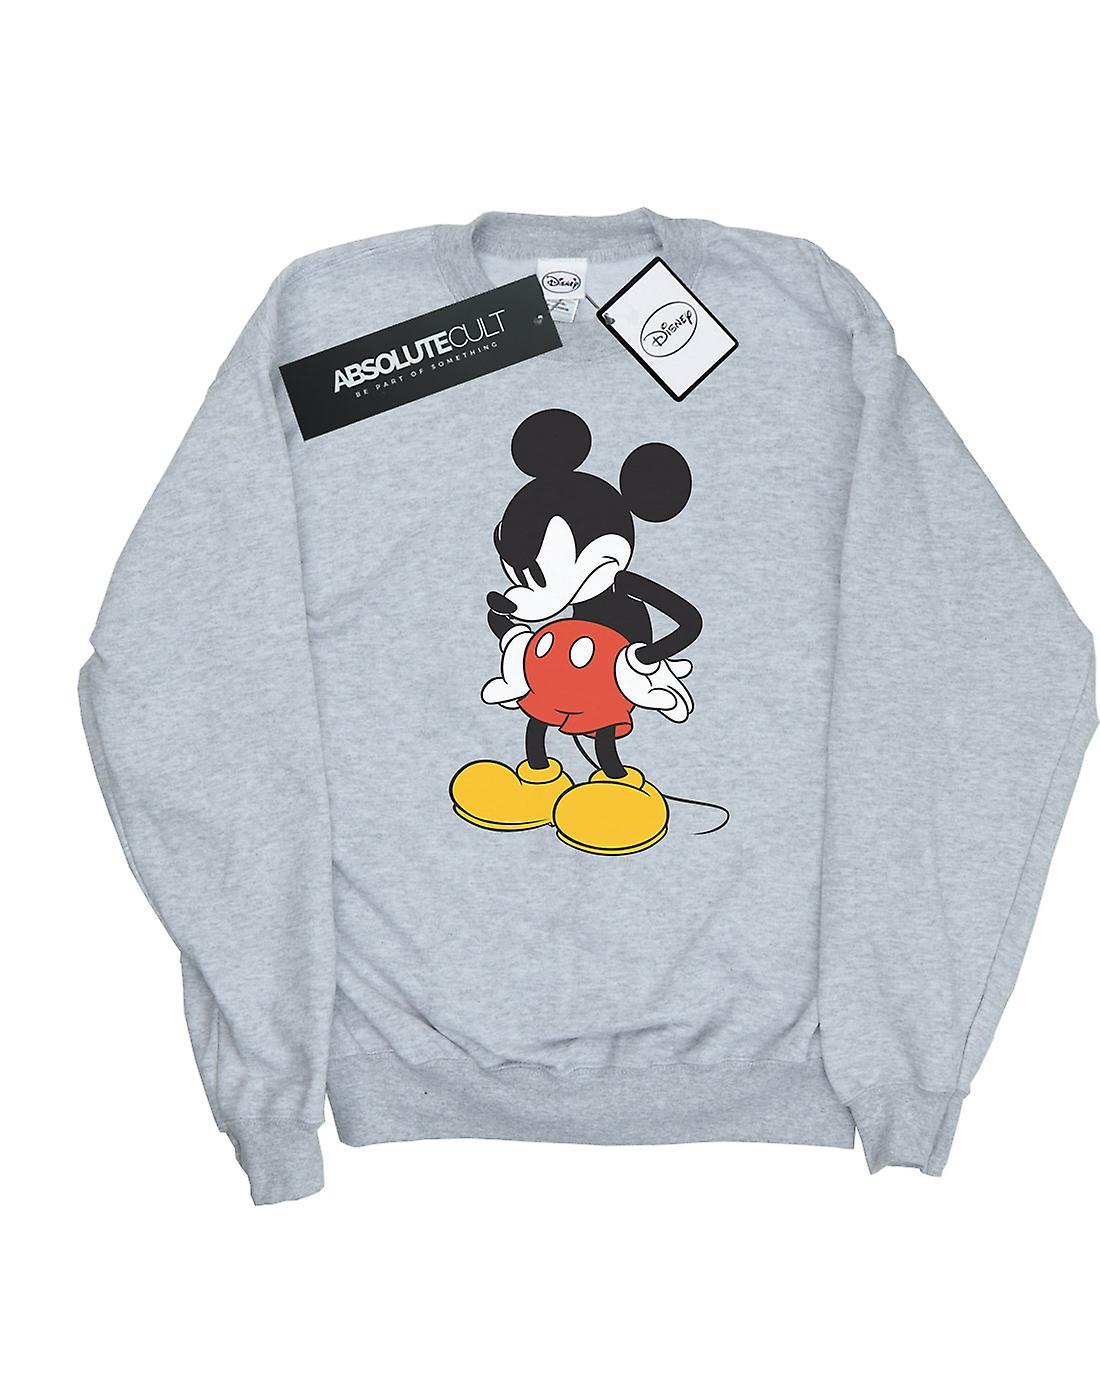 Disney Women's Mickey Mouse Angry Look Down Sweatshirt